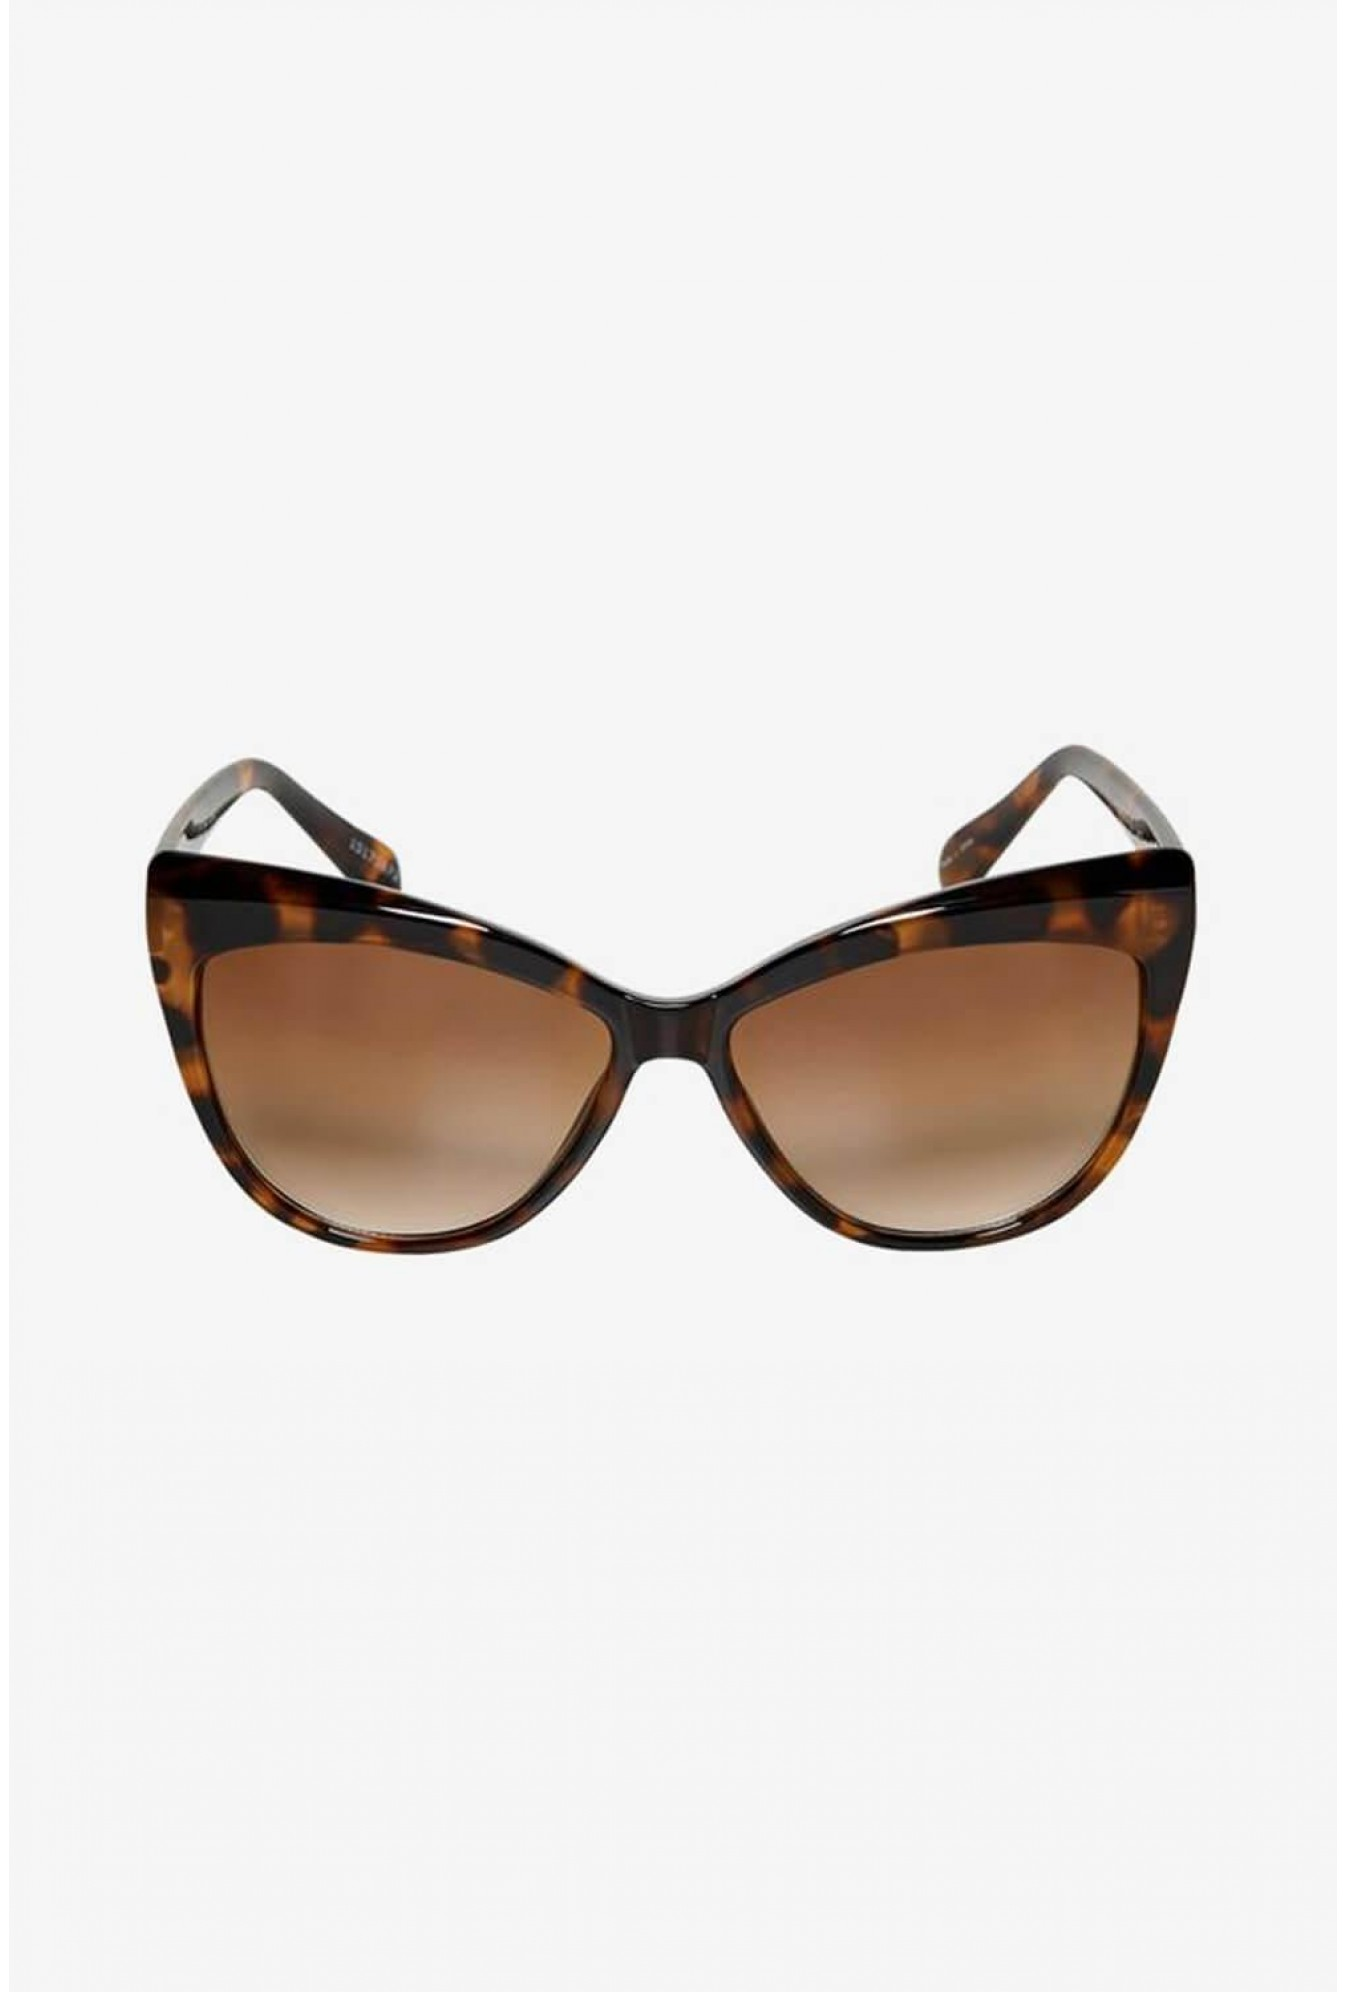 ea9ca31b13 More Views. Tortoiseshell Cat Eye Sunglasses